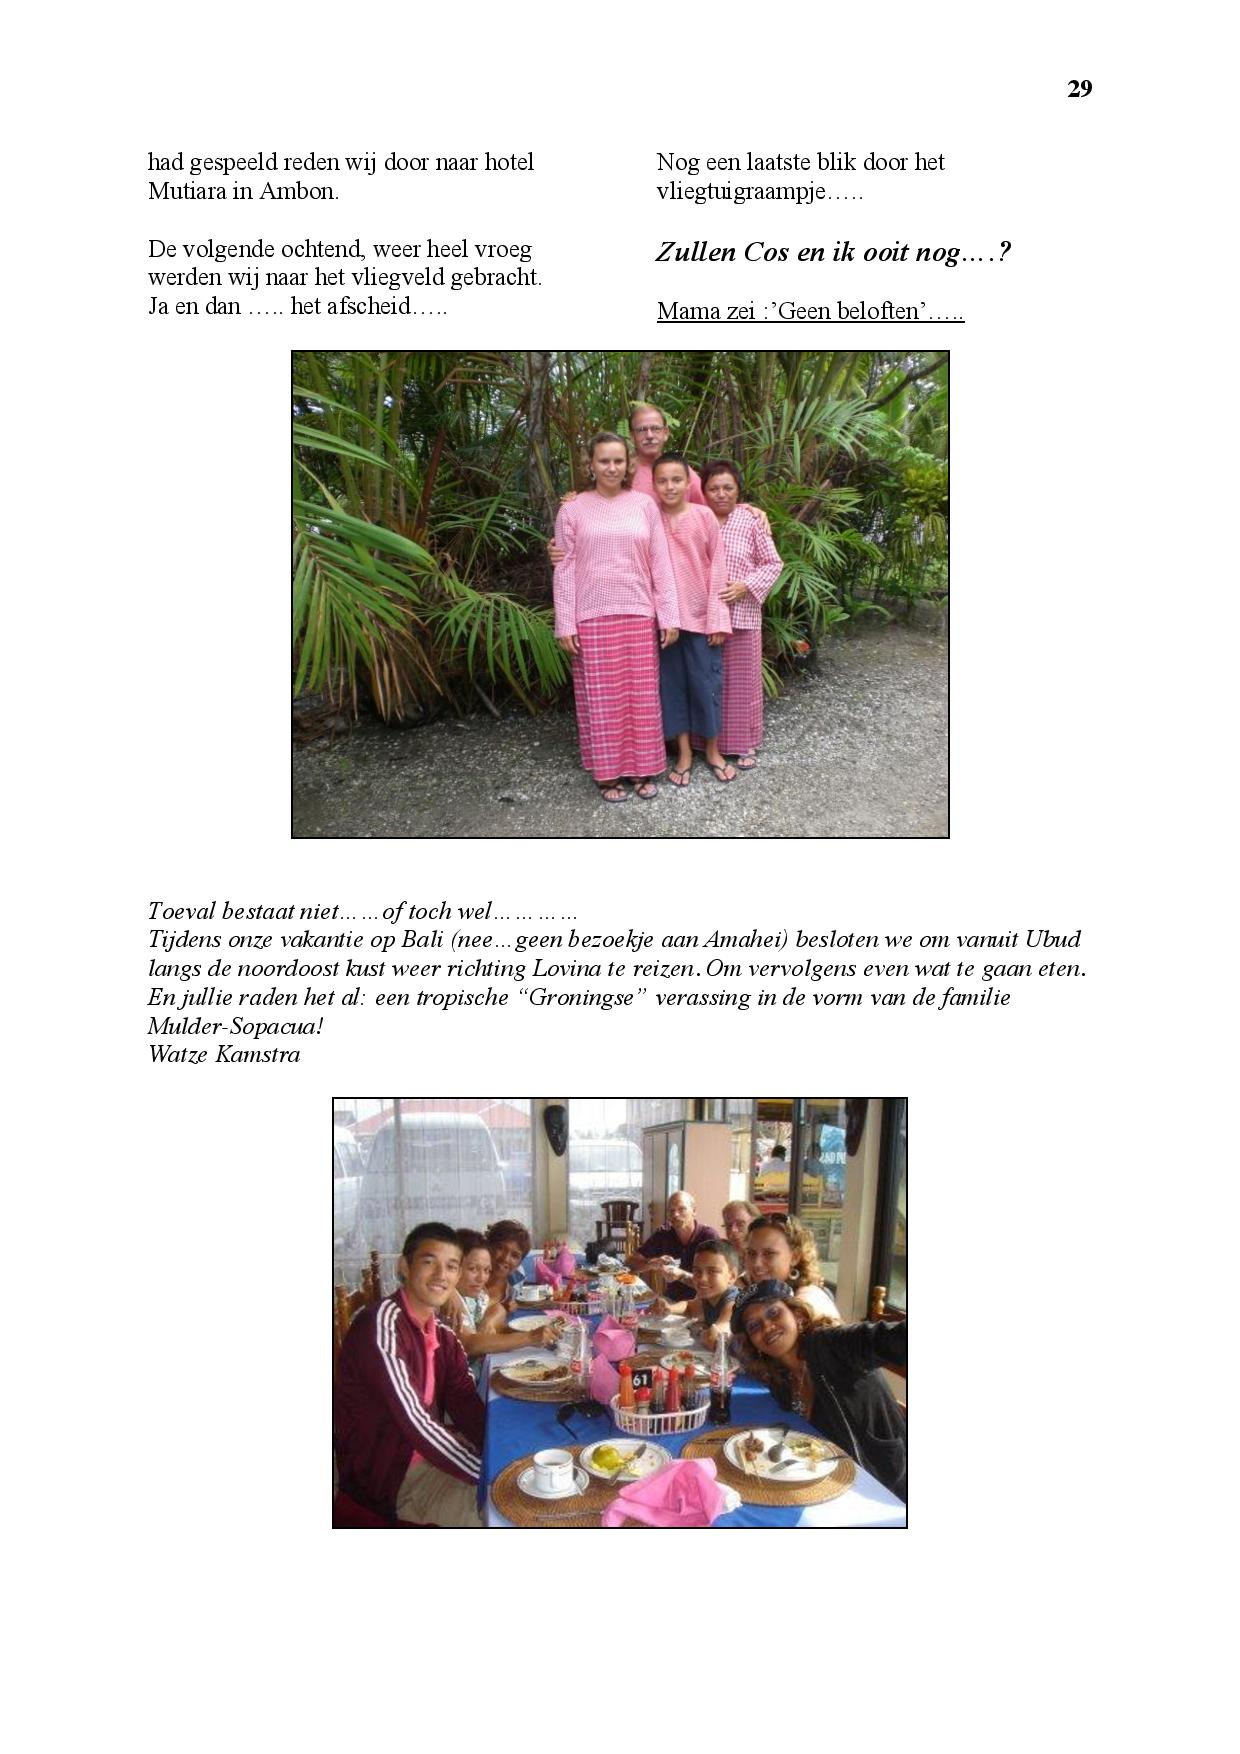 Saka Mese 3e jaargang nr. 02-2007 definitieve webversie-page-029